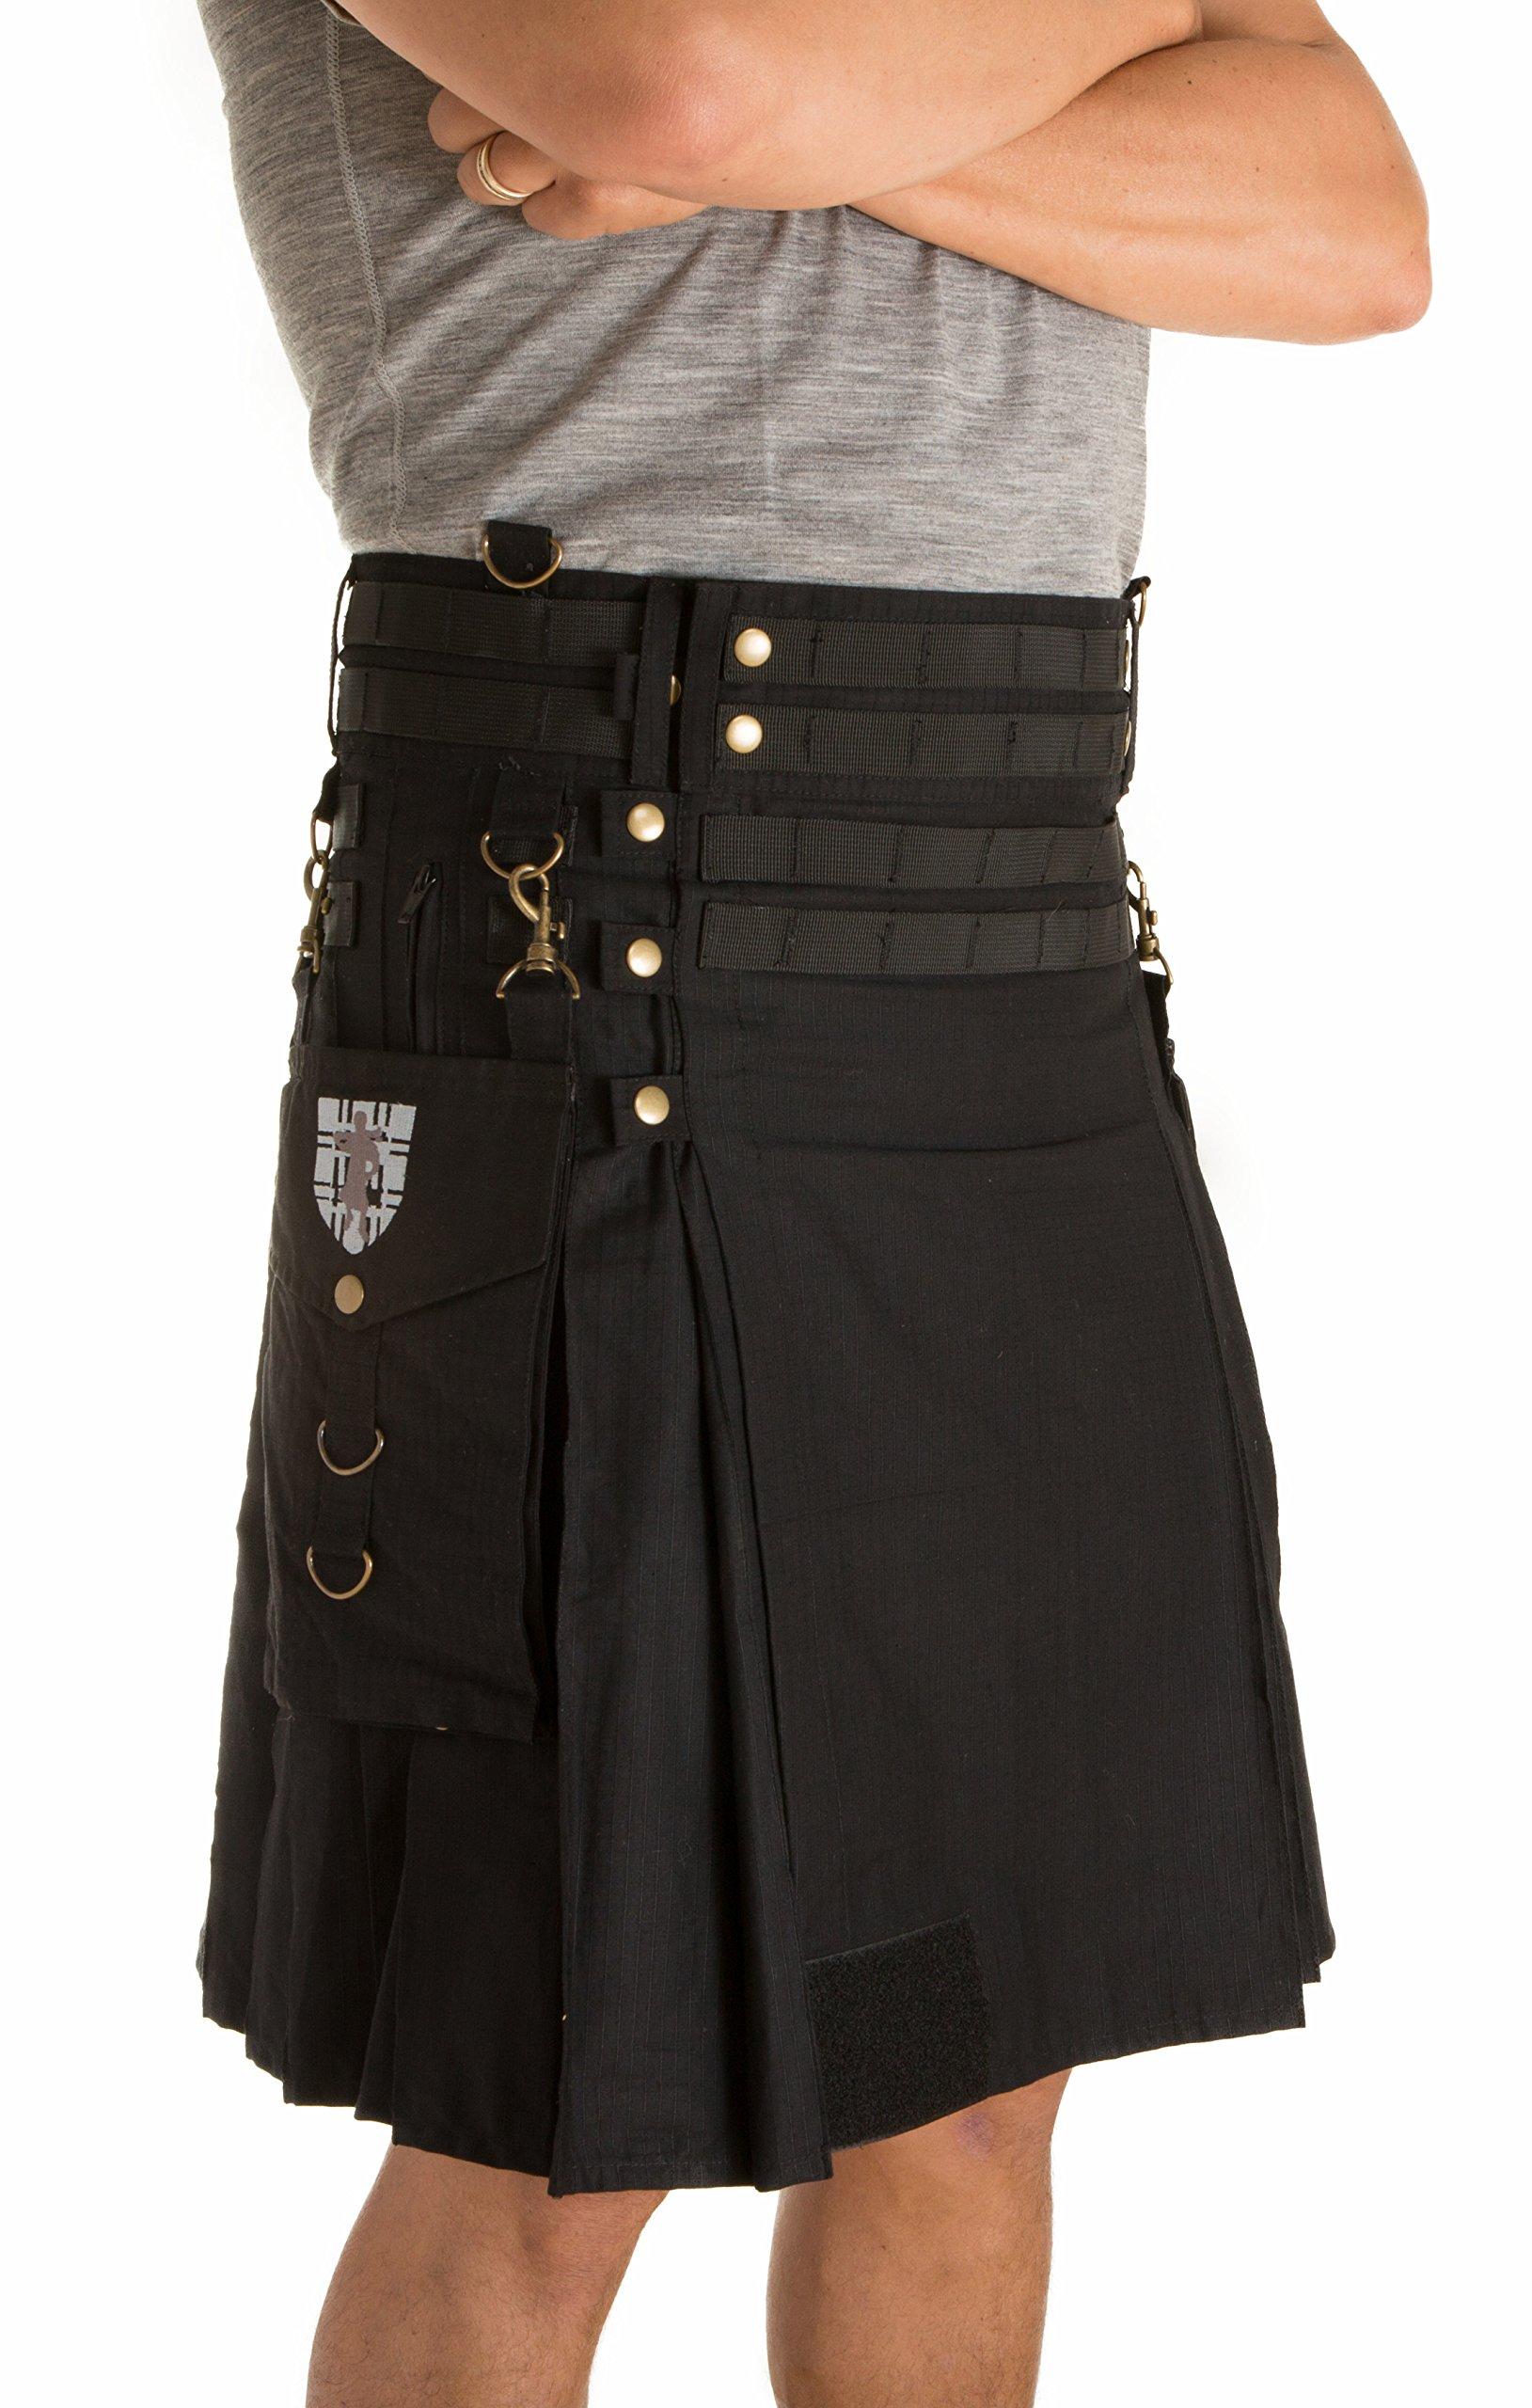 Damn Near Kilt 'Em Men's Tactical Kilt Small-Medium Black